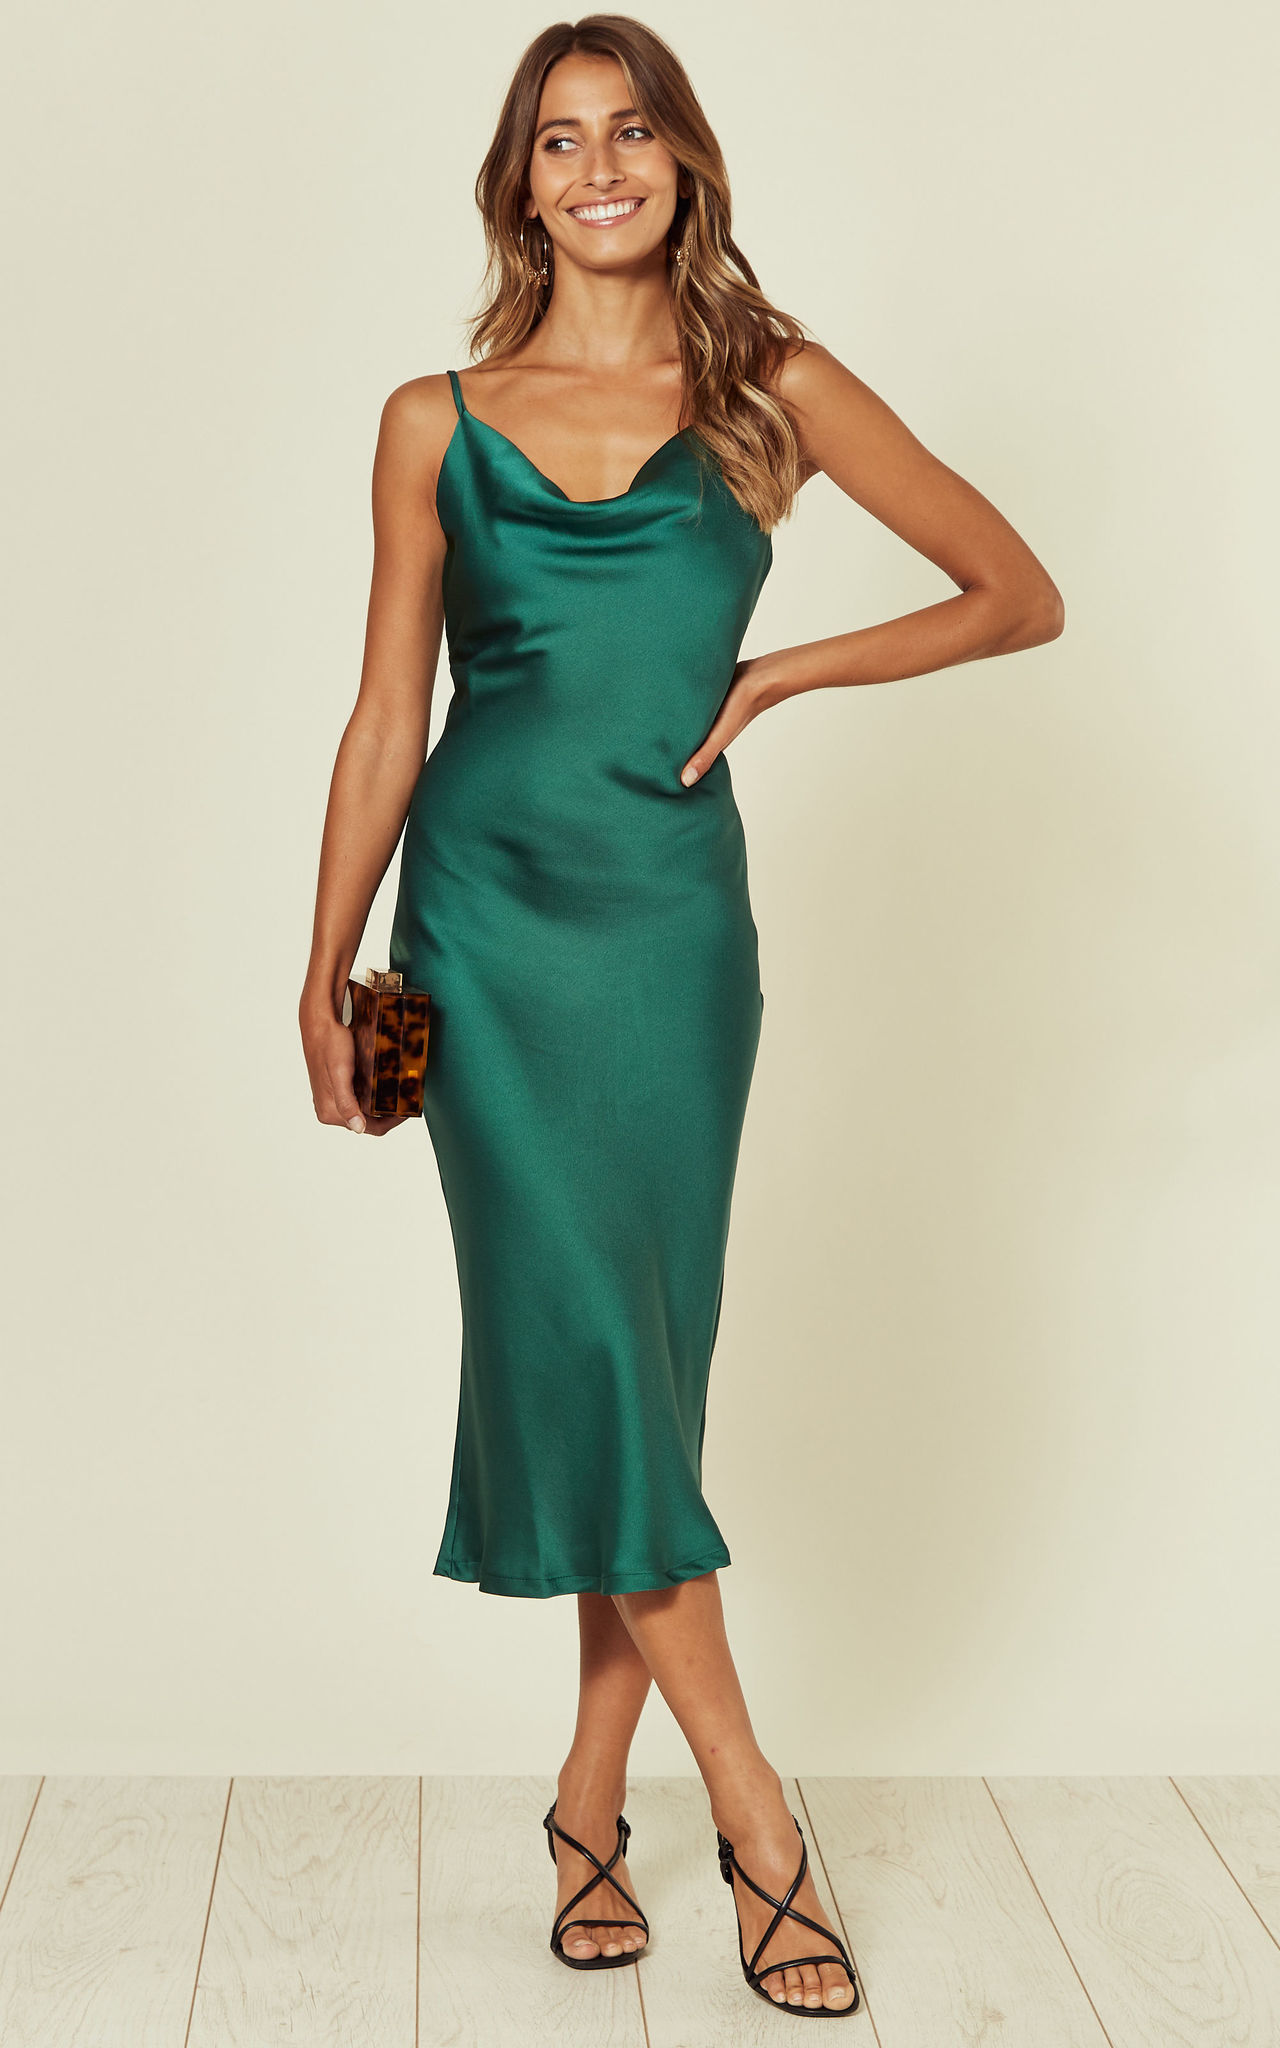 Model wears a green midi slip dress with cowl neck